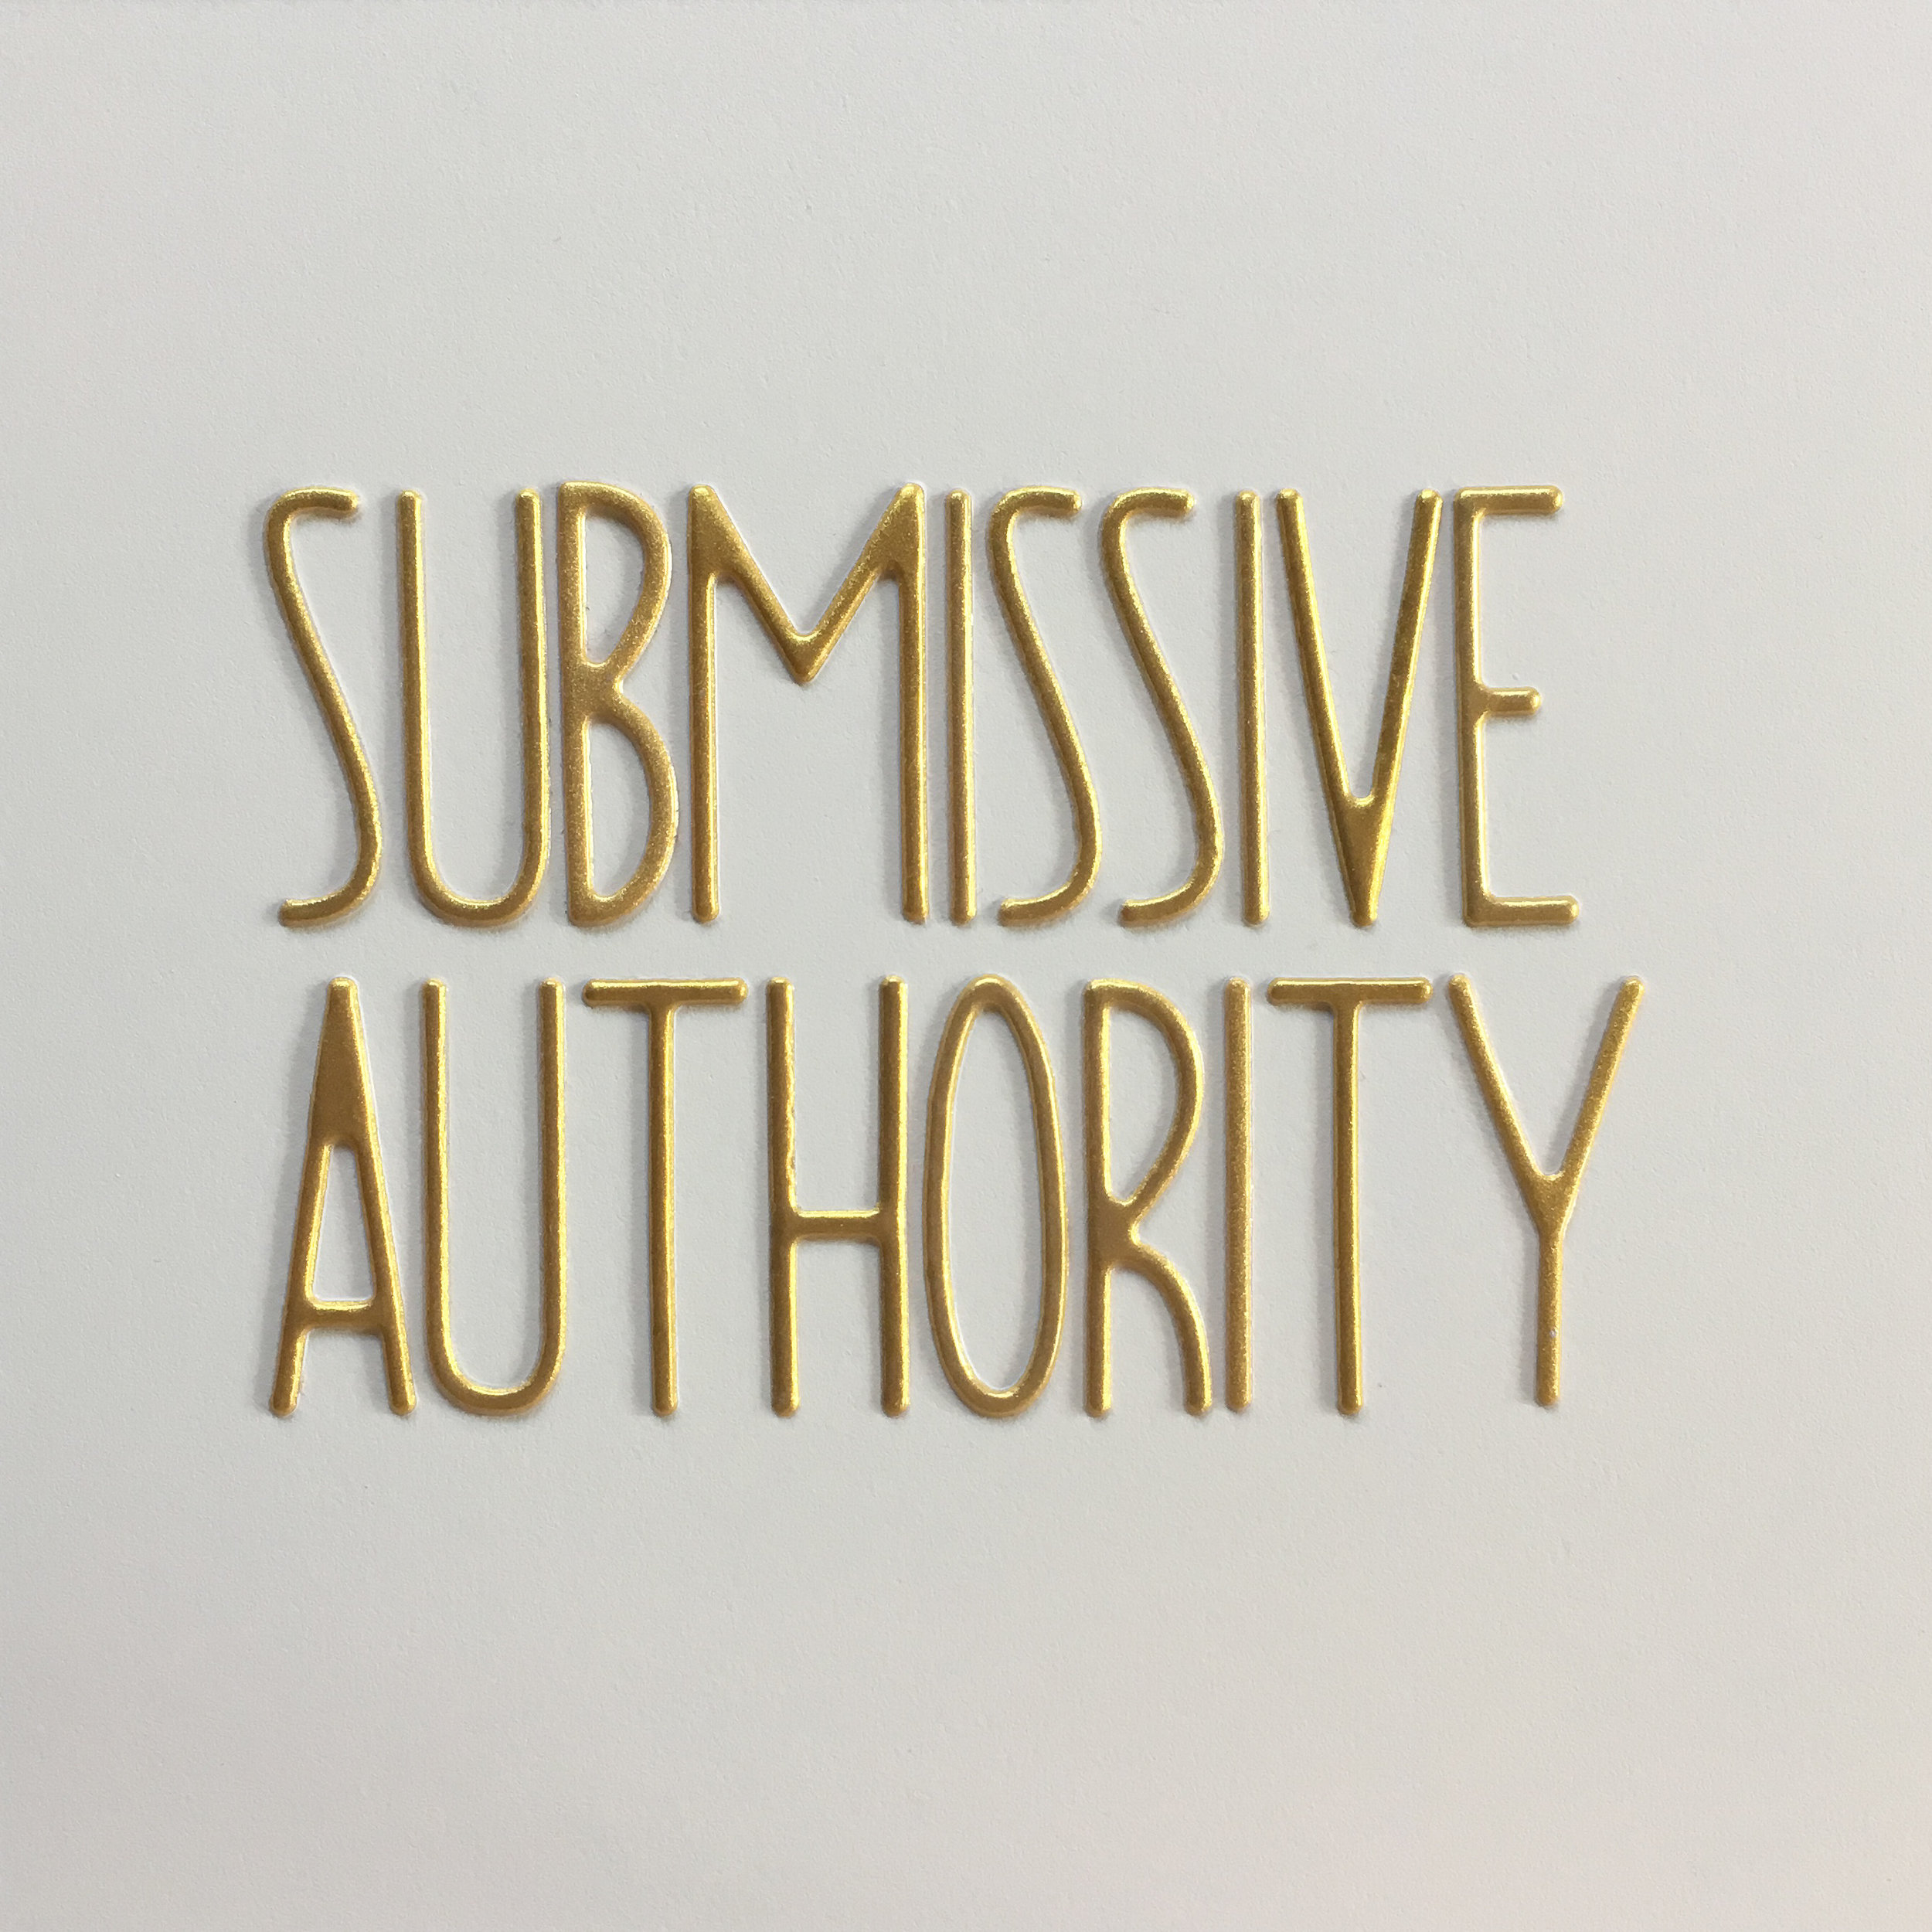 submissive authority.jpg